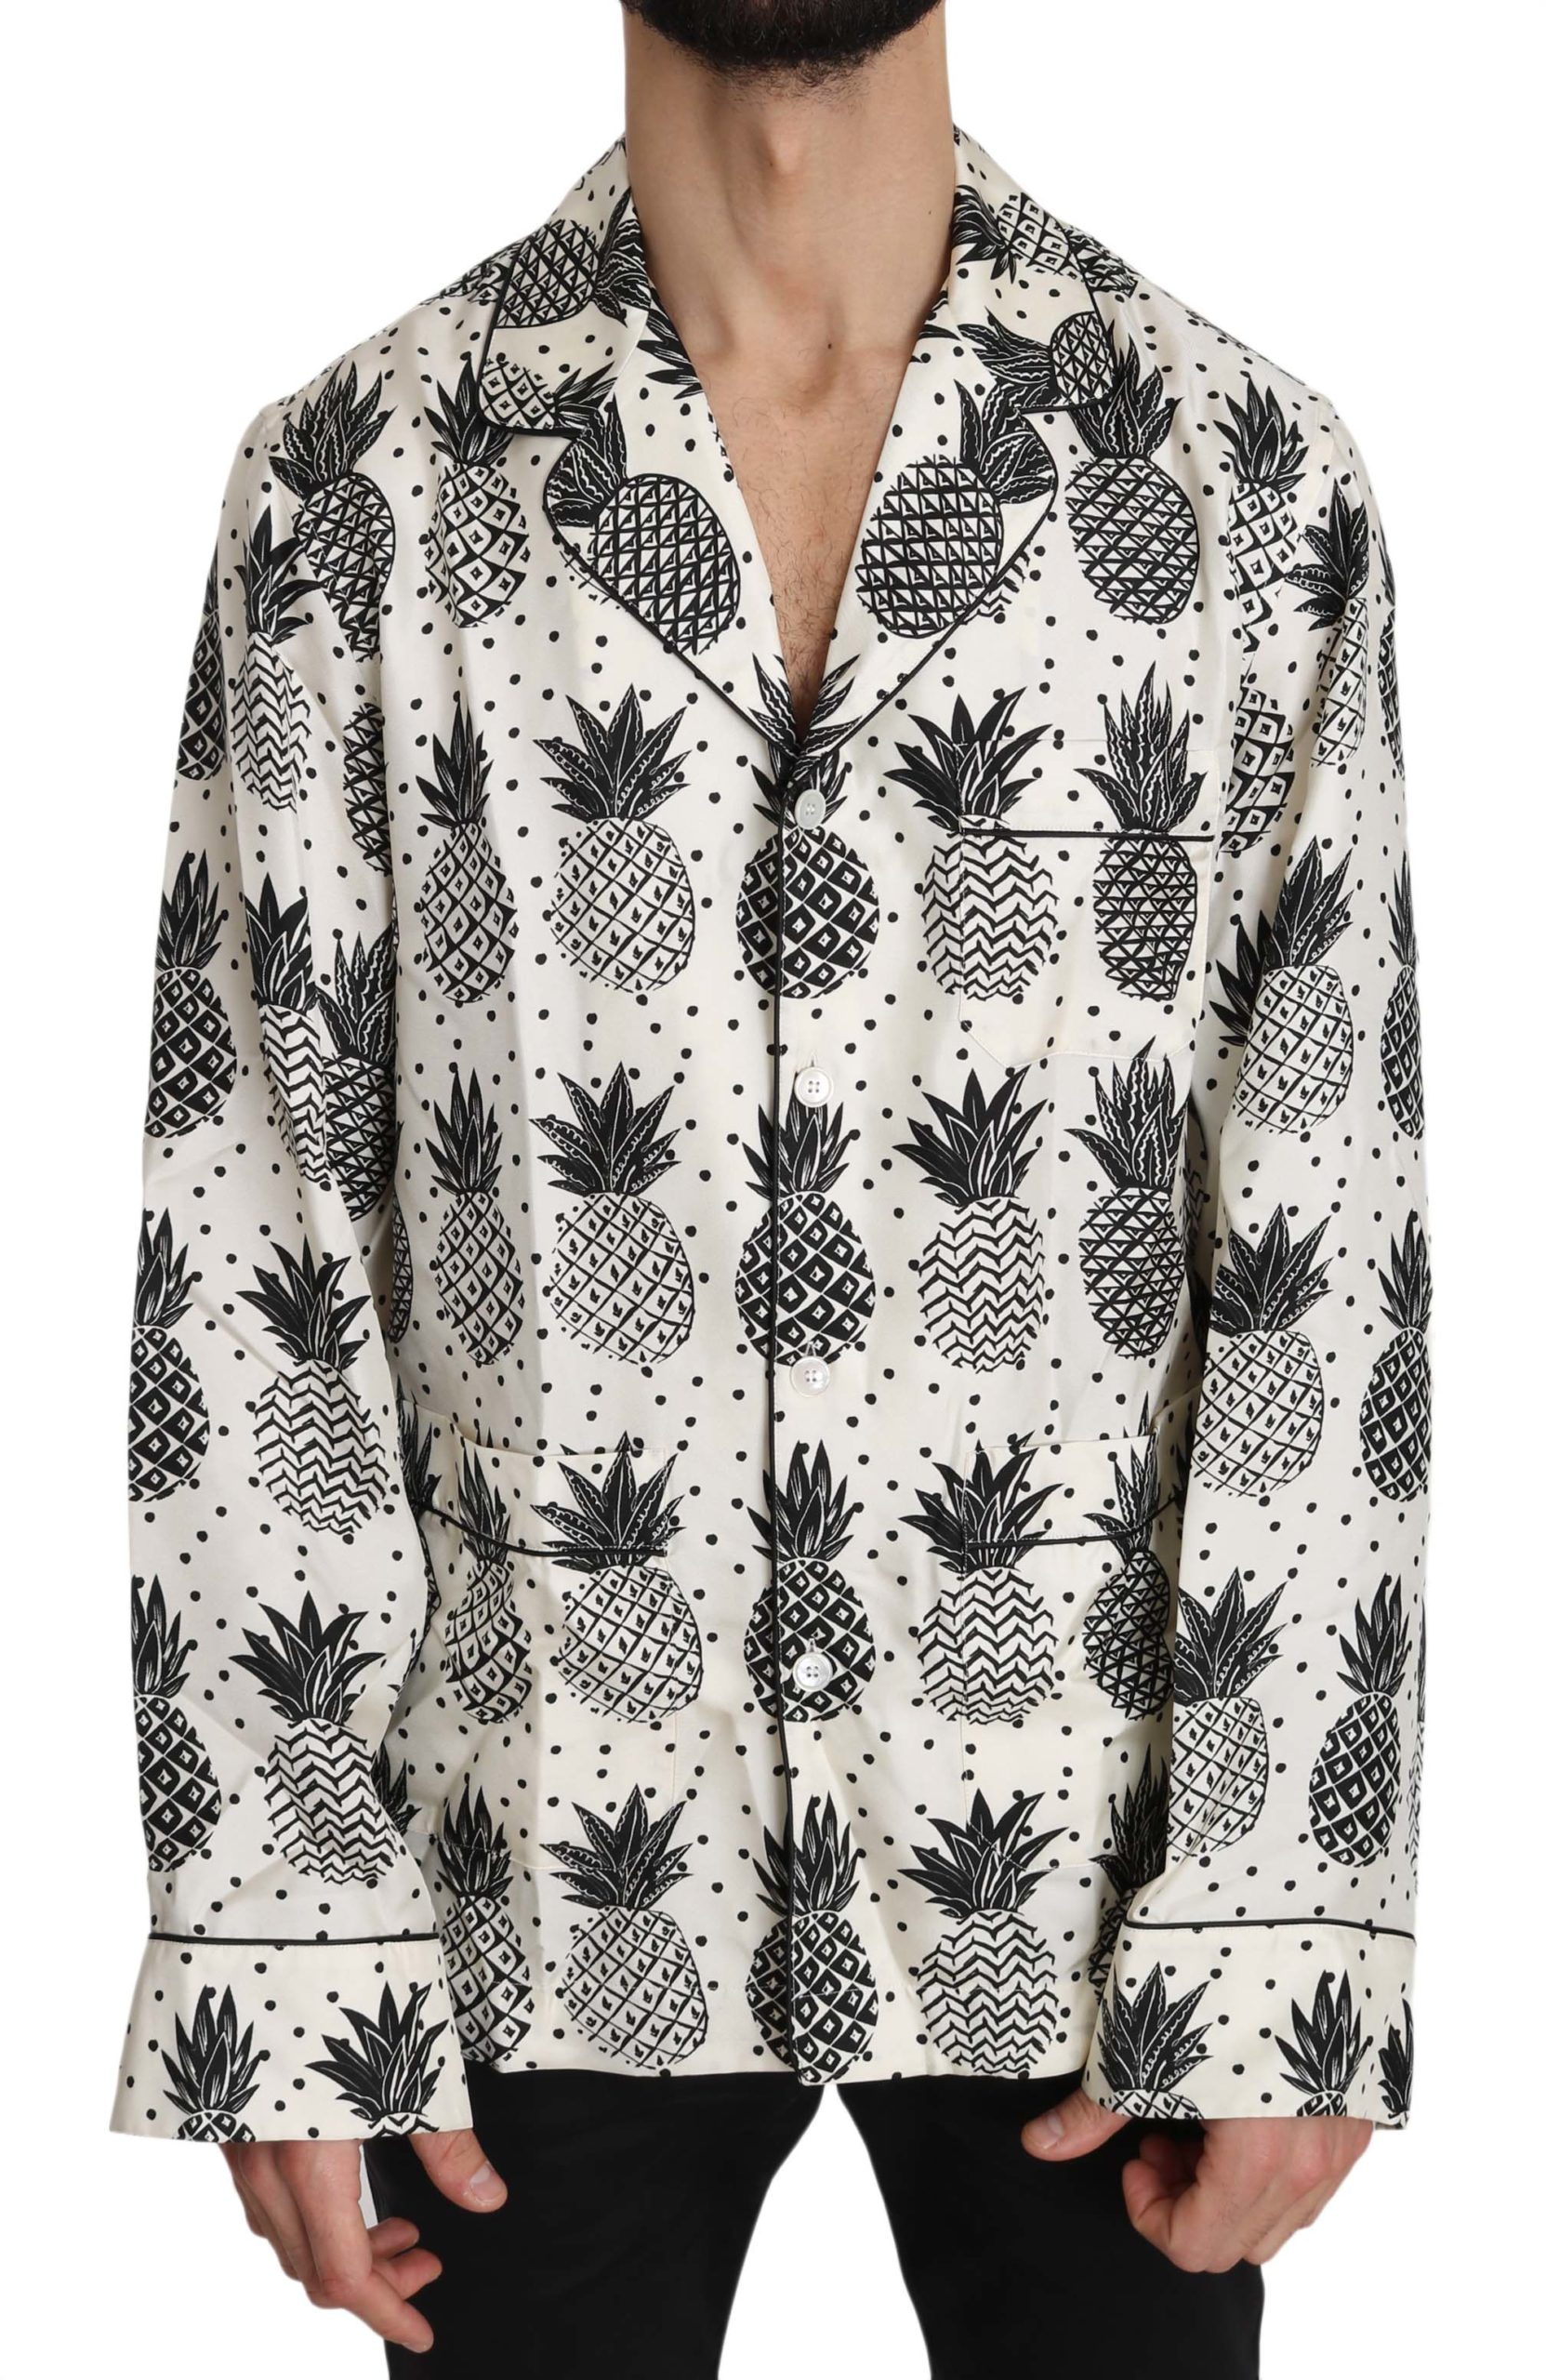 Dolce & Gabbana Men's Pineapple Silk Shirt White TSH3363 - IT38 | XS